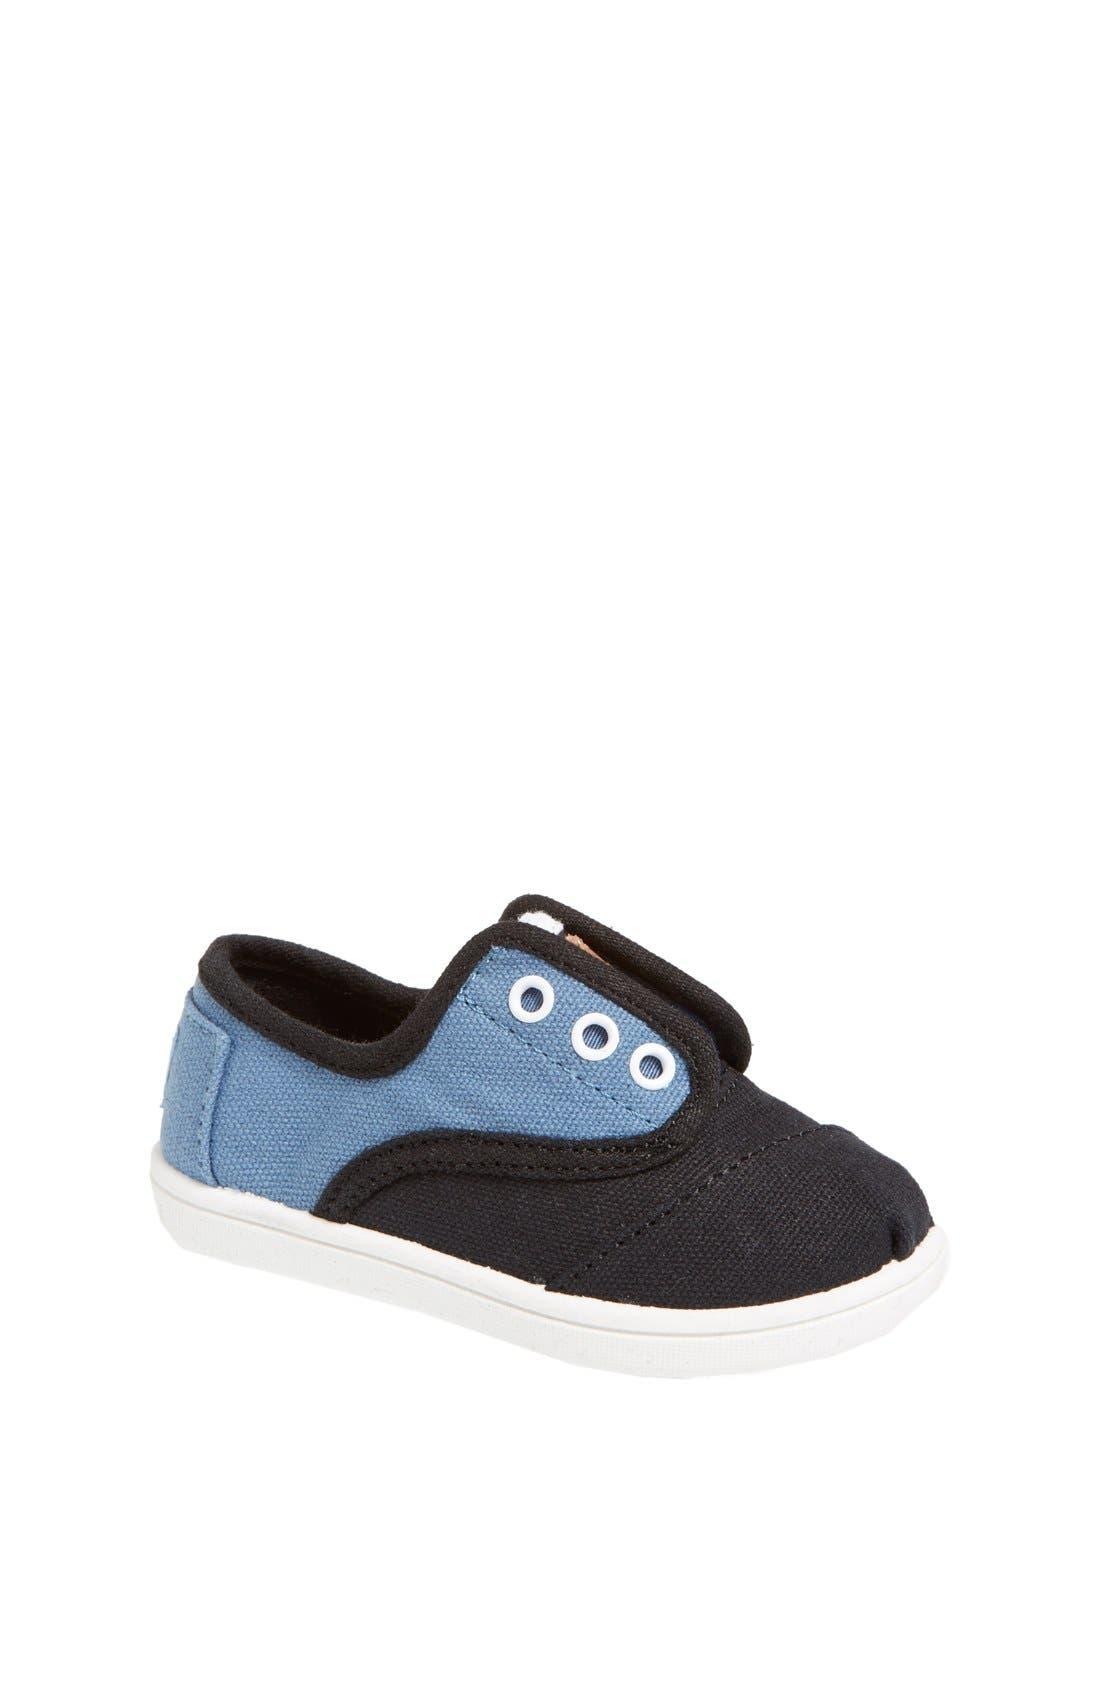 Alternate Image 1 Selected - TOMS 'Cordones - Tiny' Sneaker (Baby, Walker & Toddler)